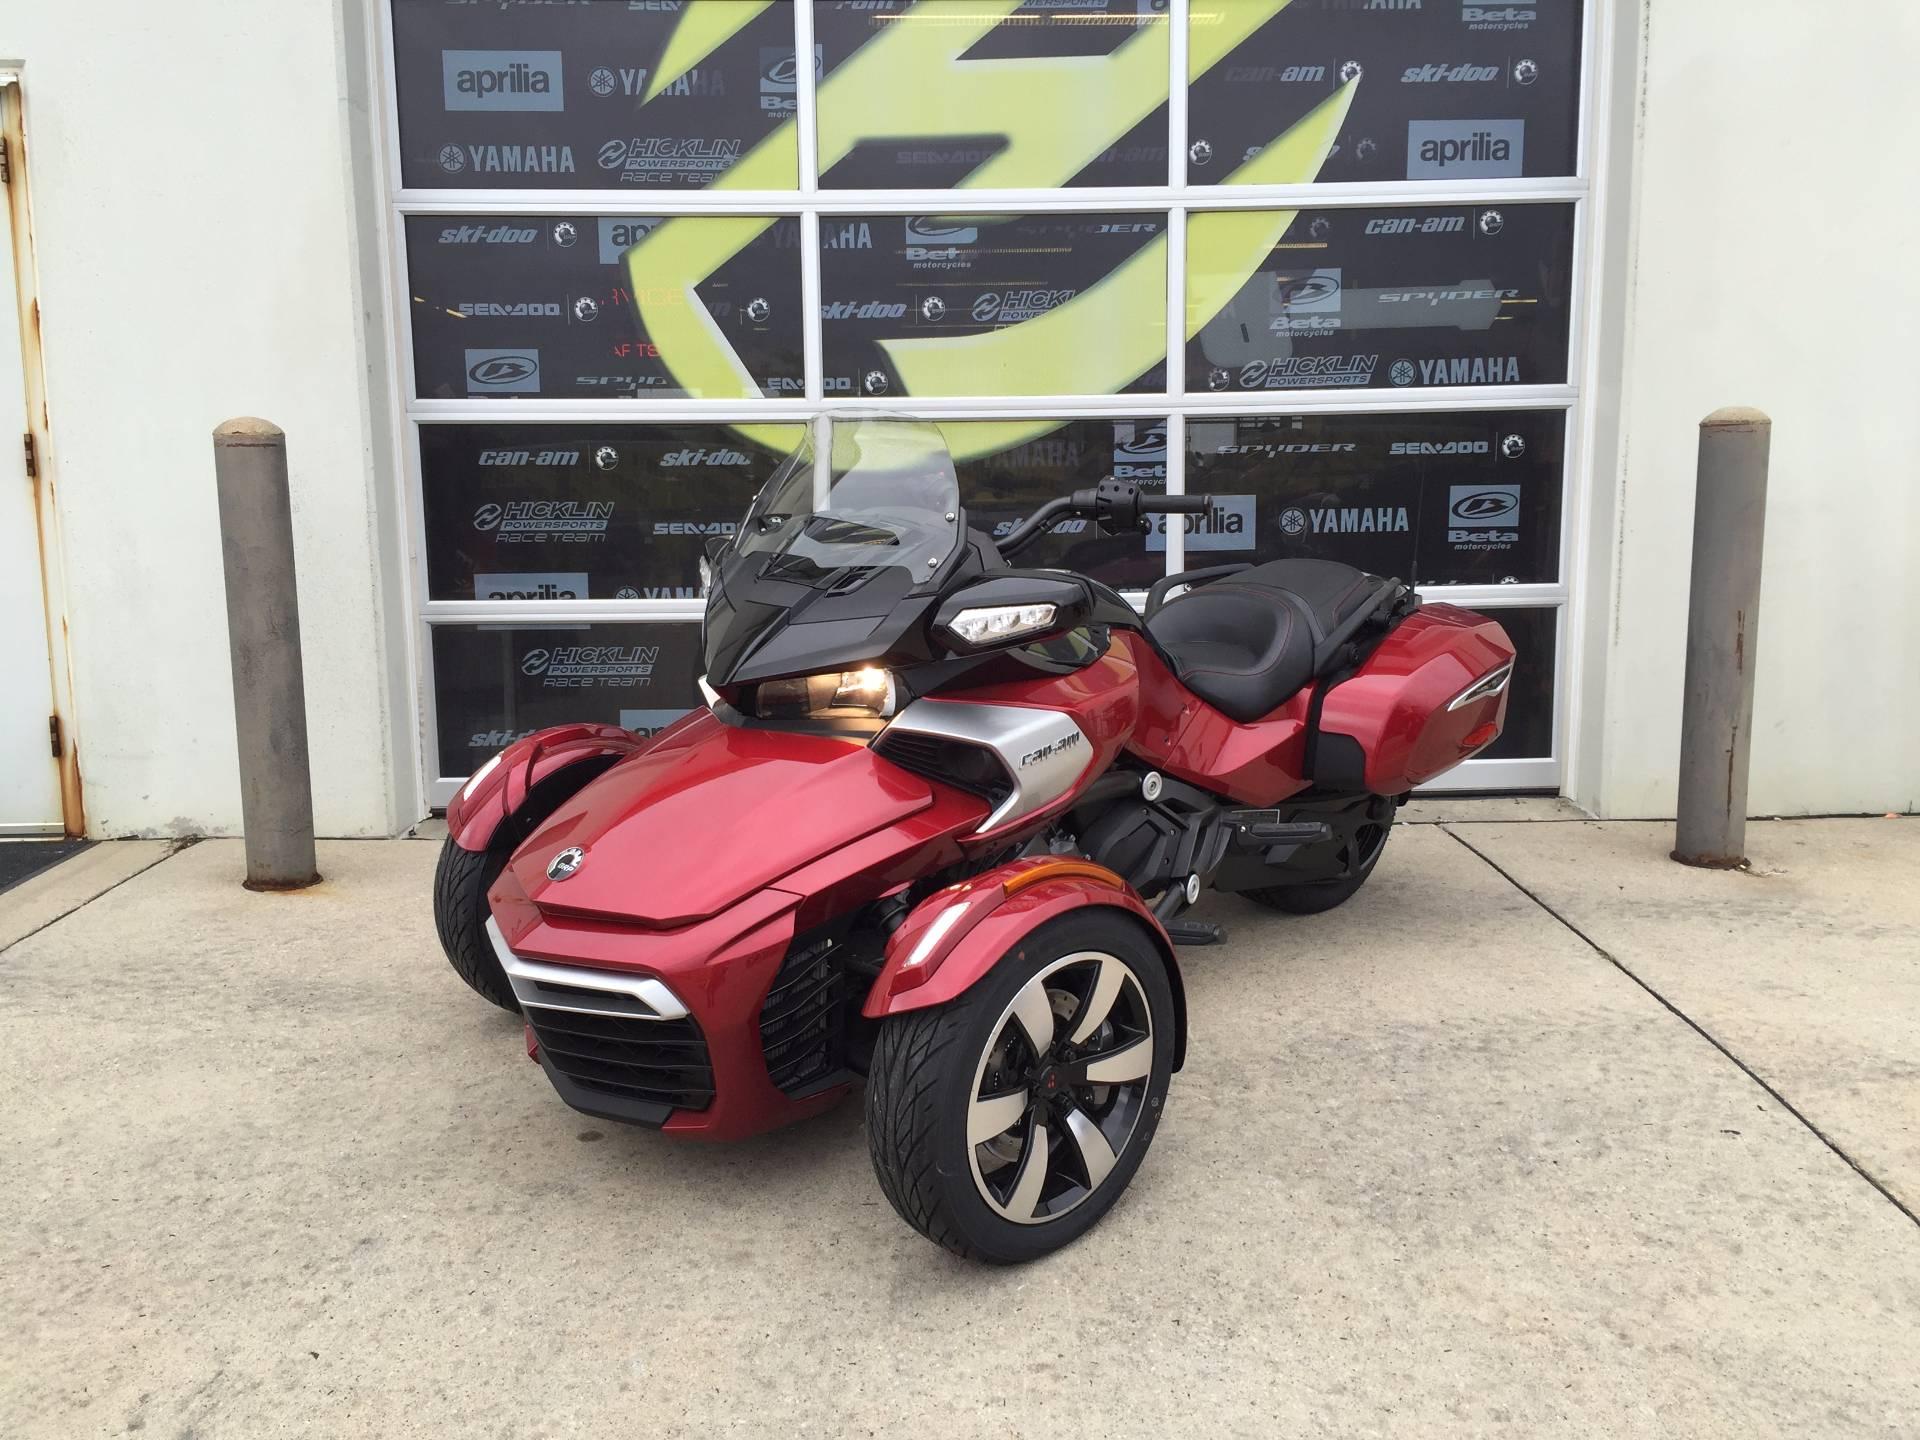 2016 Can-Am Spyder F3-T SE6 w/ Audio System in Grimes, Iowa